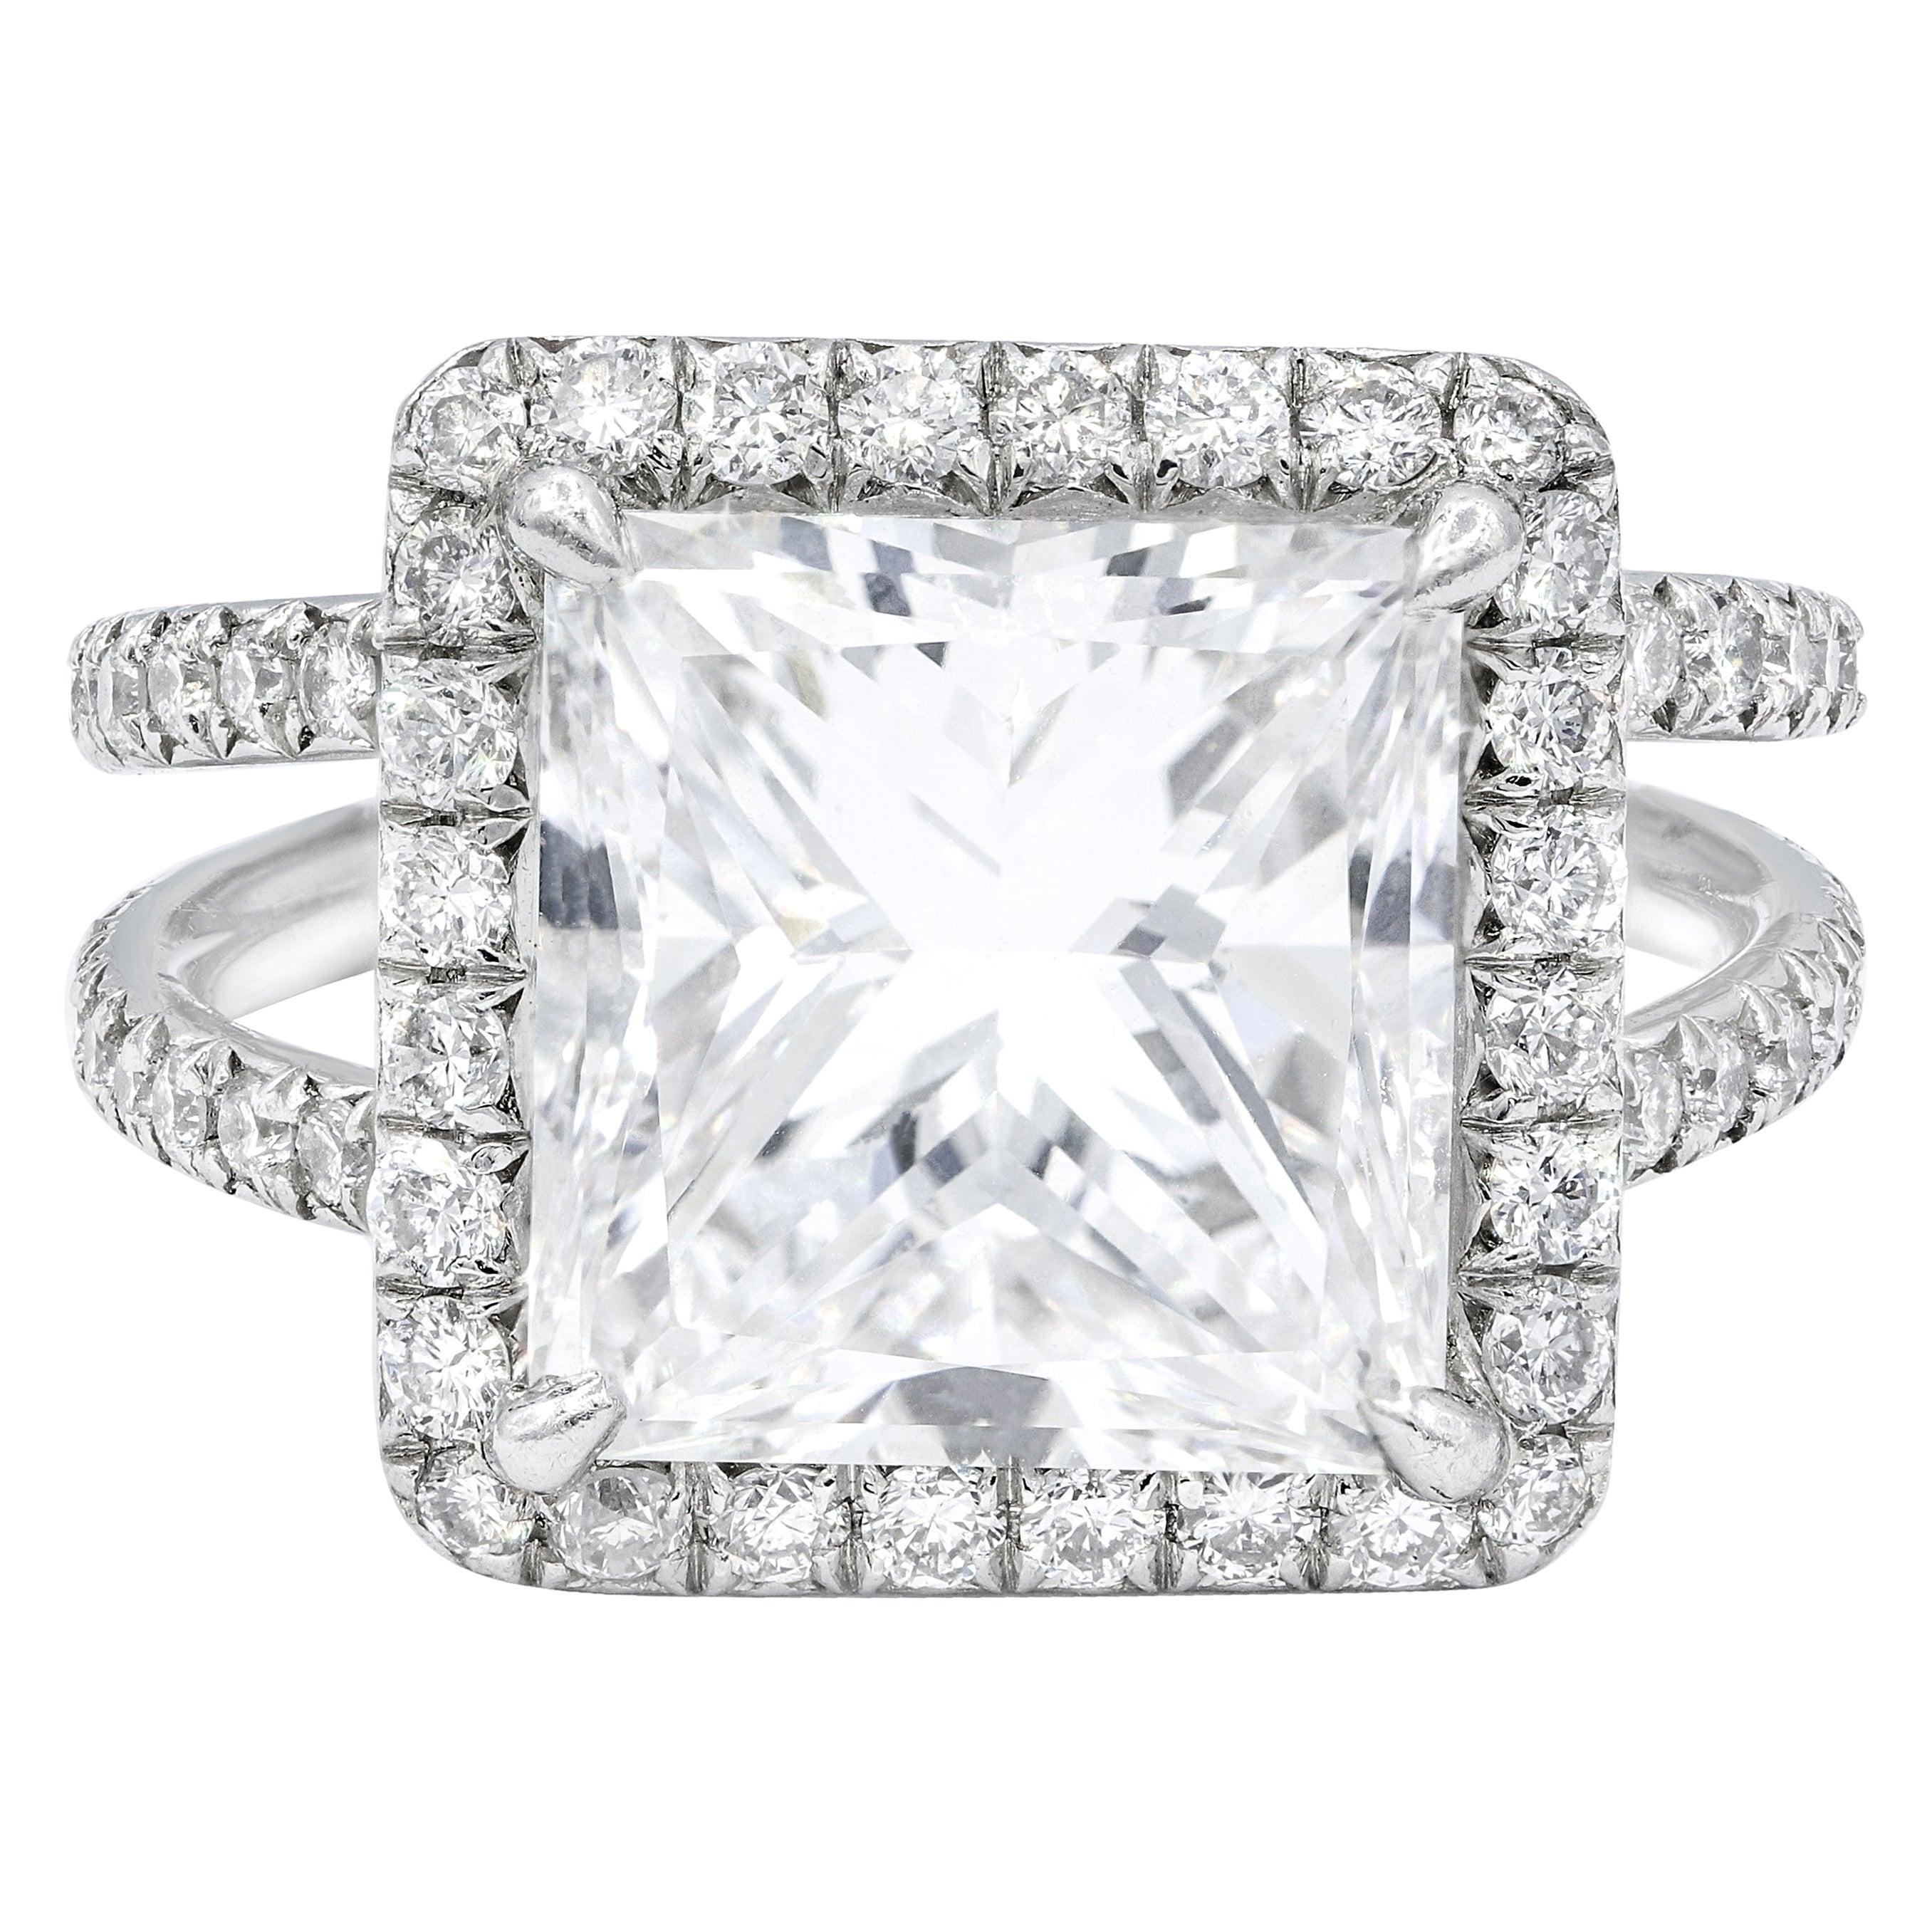 GIA Certified 5.09 Carat E-VS2 Engagement Ring